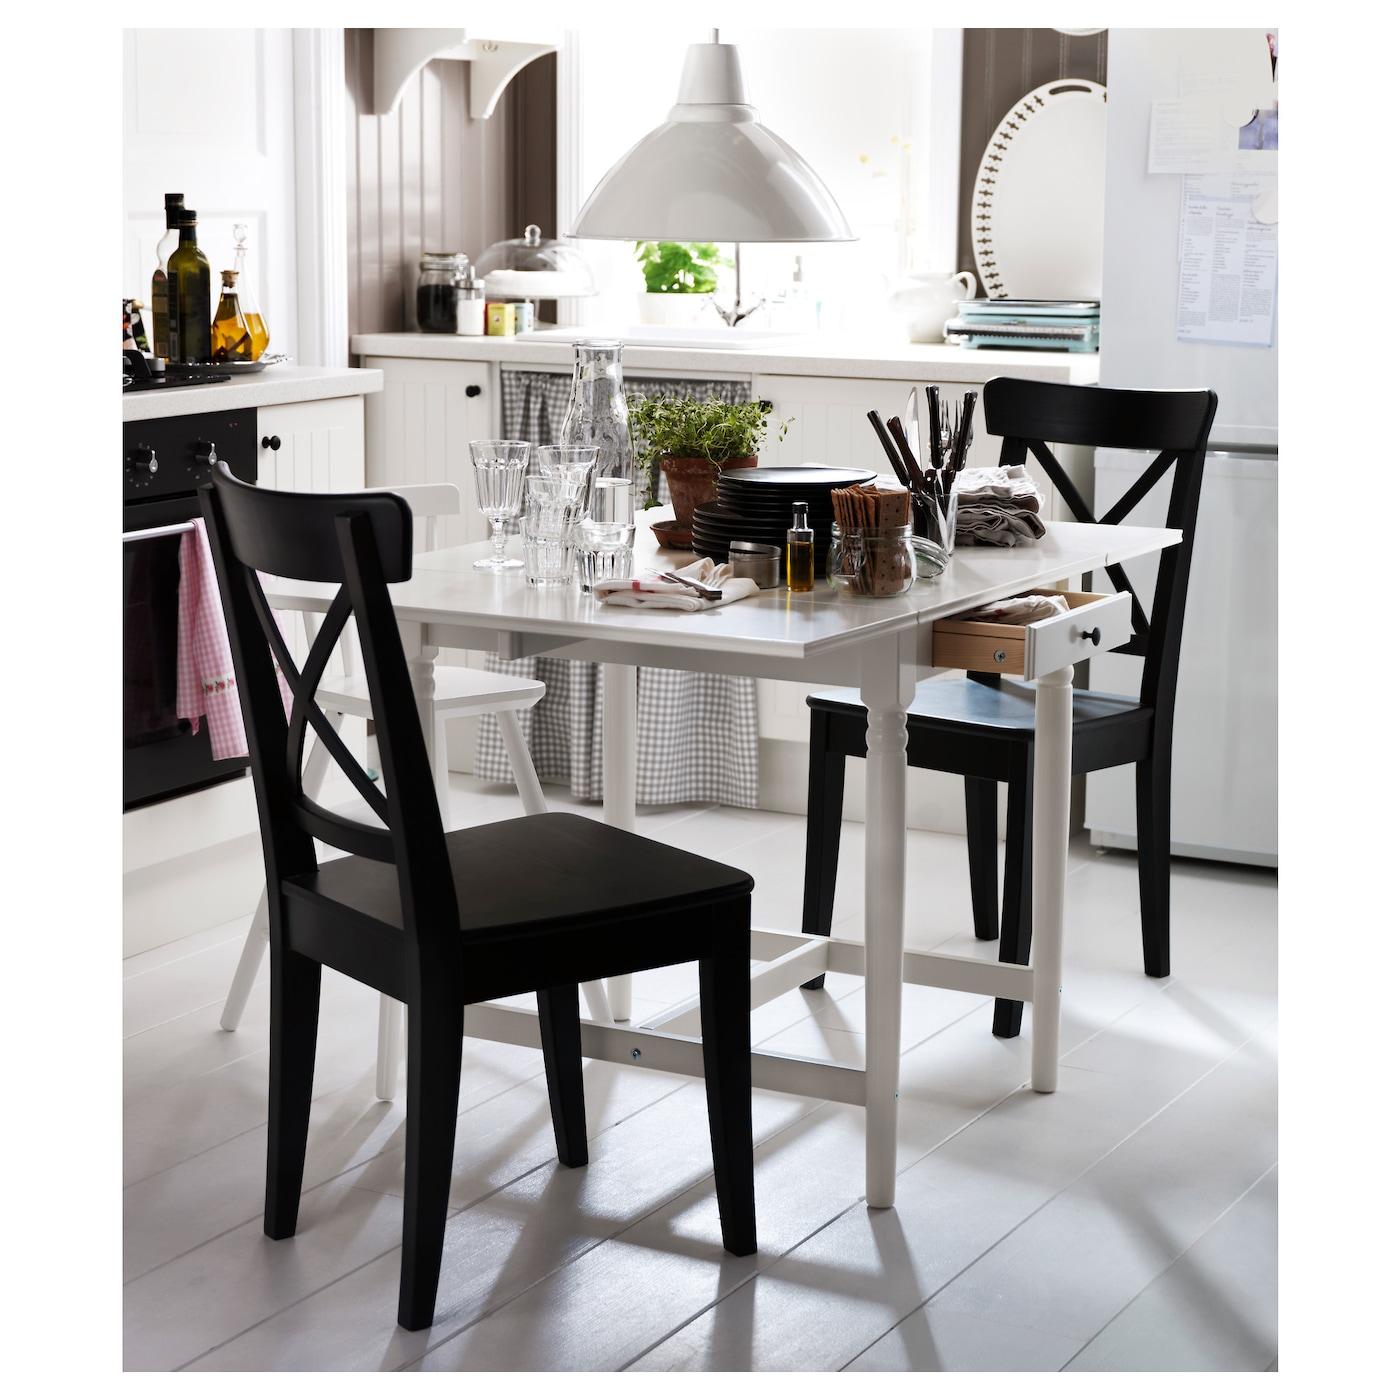 ingatorp table rabats blanc 65 123 x 78 cm ikea. Black Bedroom Furniture Sets. Home Design Ideas